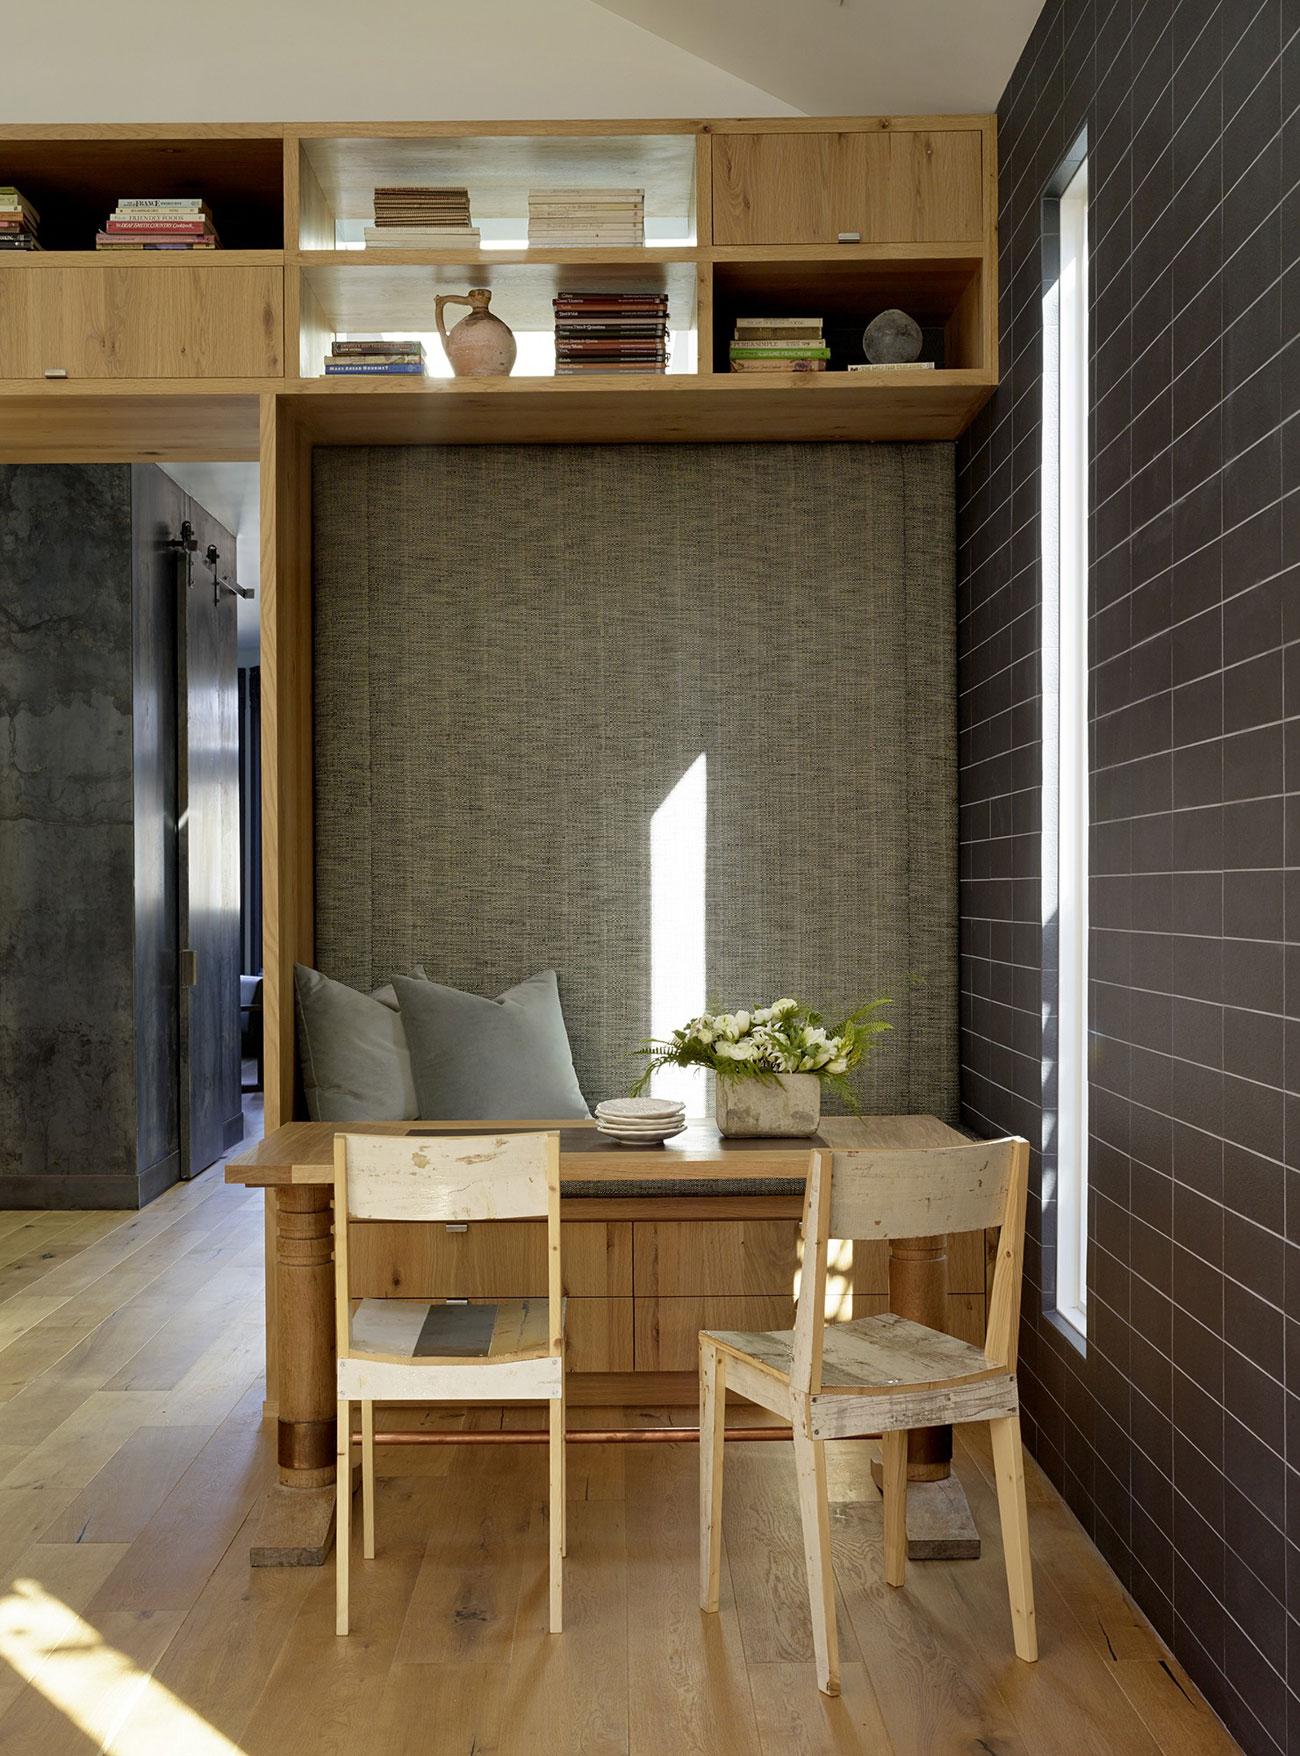 Traditional victorian house with modern interior homedezen - Decoration interieur maison moderne ...